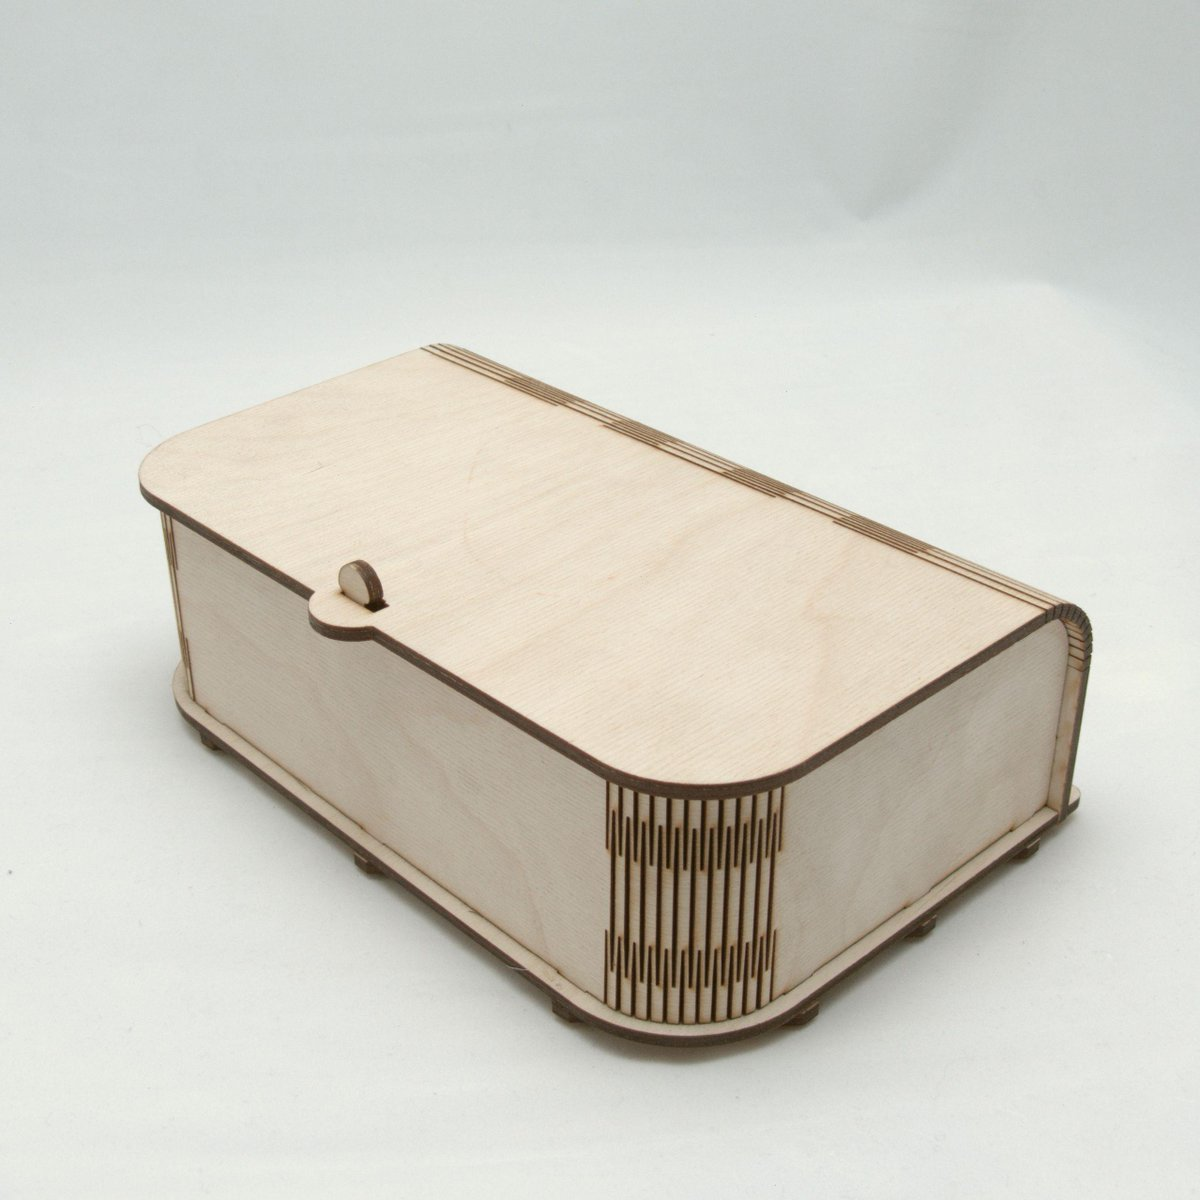 laser cut wood box template - lasercraft creations on twitter laser cut wooden box